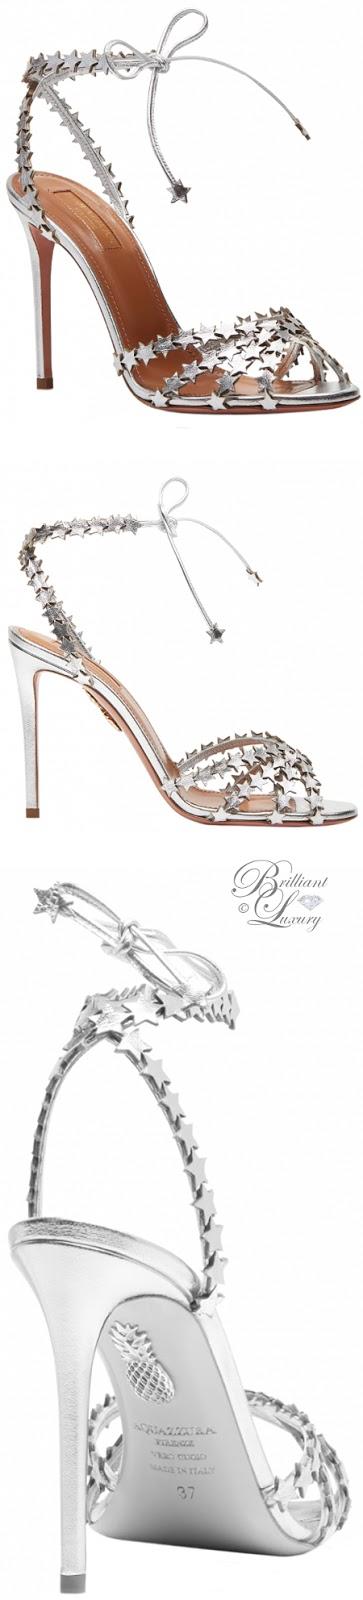 Brilliant Luxury ♦ Aquazzura Starlight Sandals